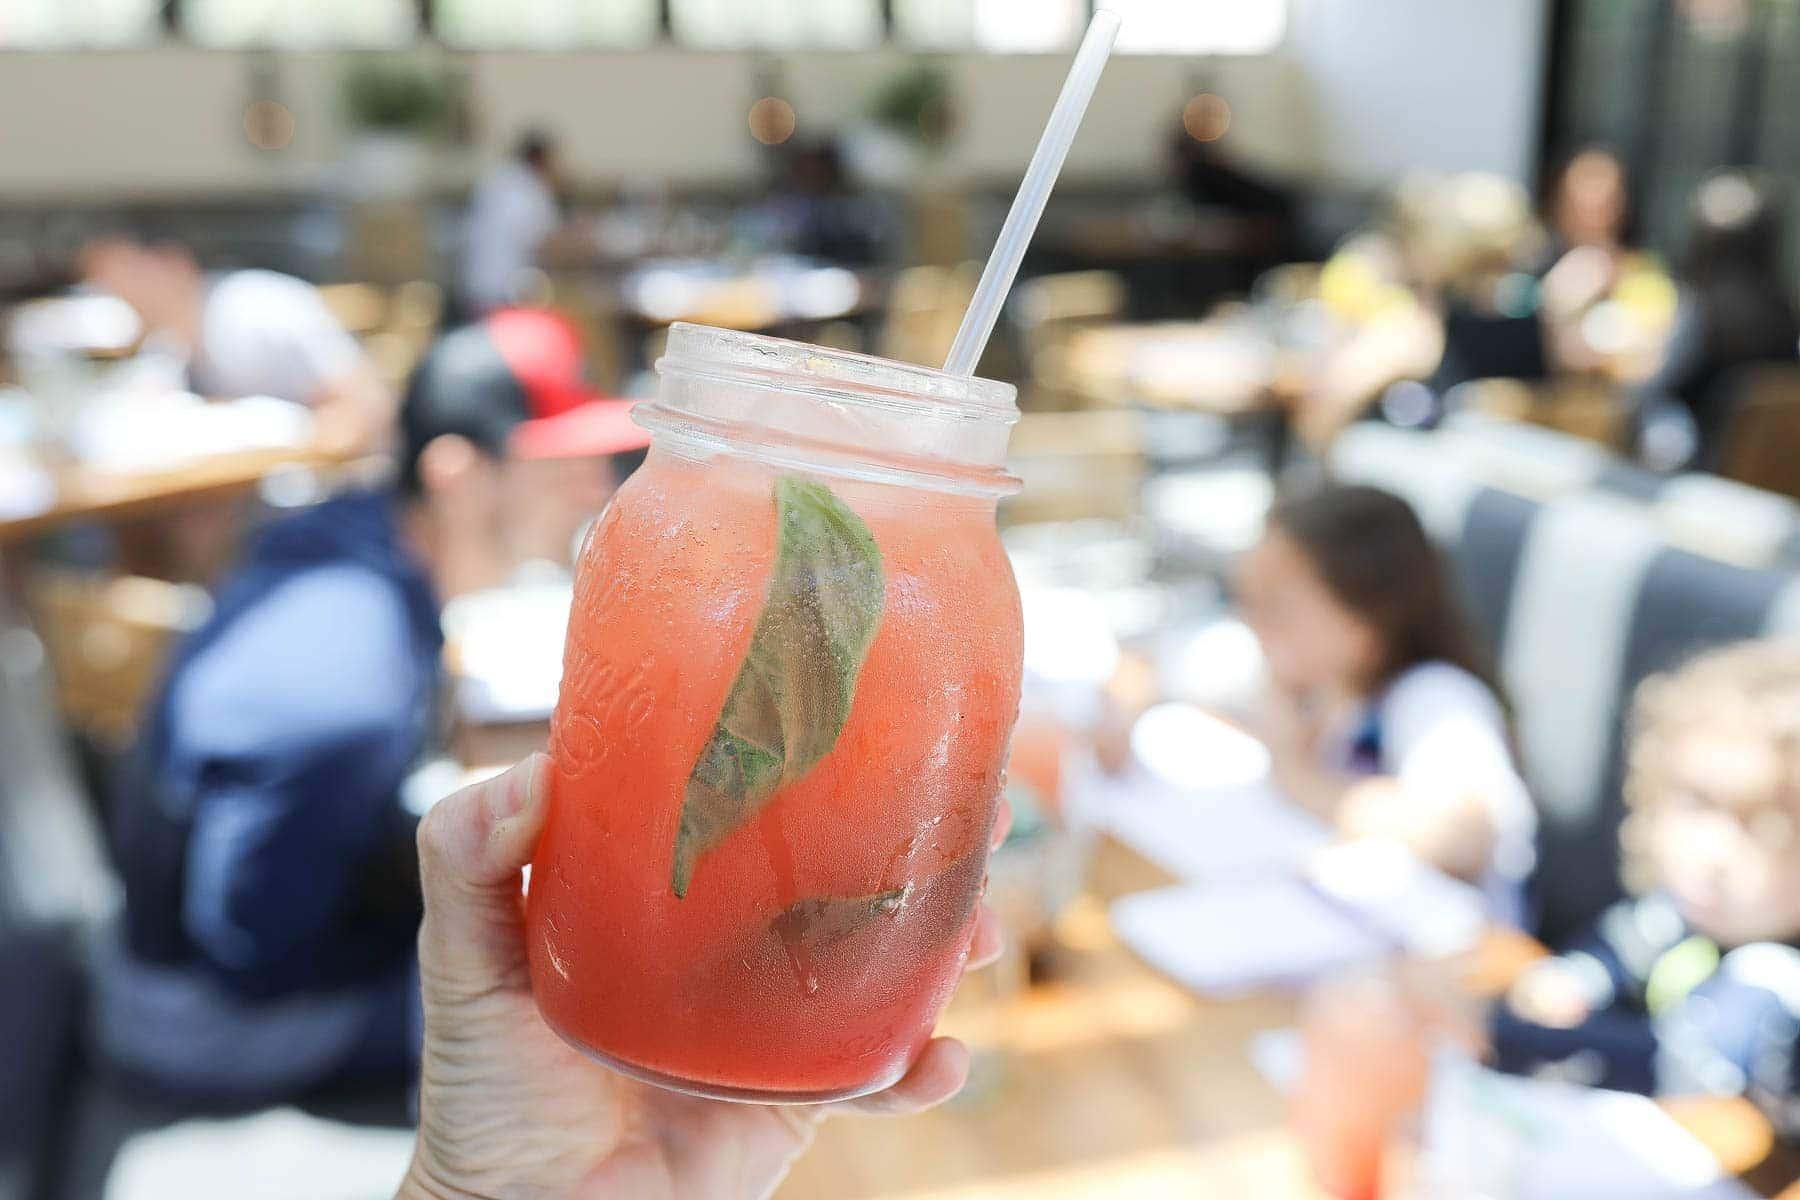 Fruit Juice in a Jar #familytravelsandiego #sandiego #fourseasonsresidenceclub #bigfamilytravel